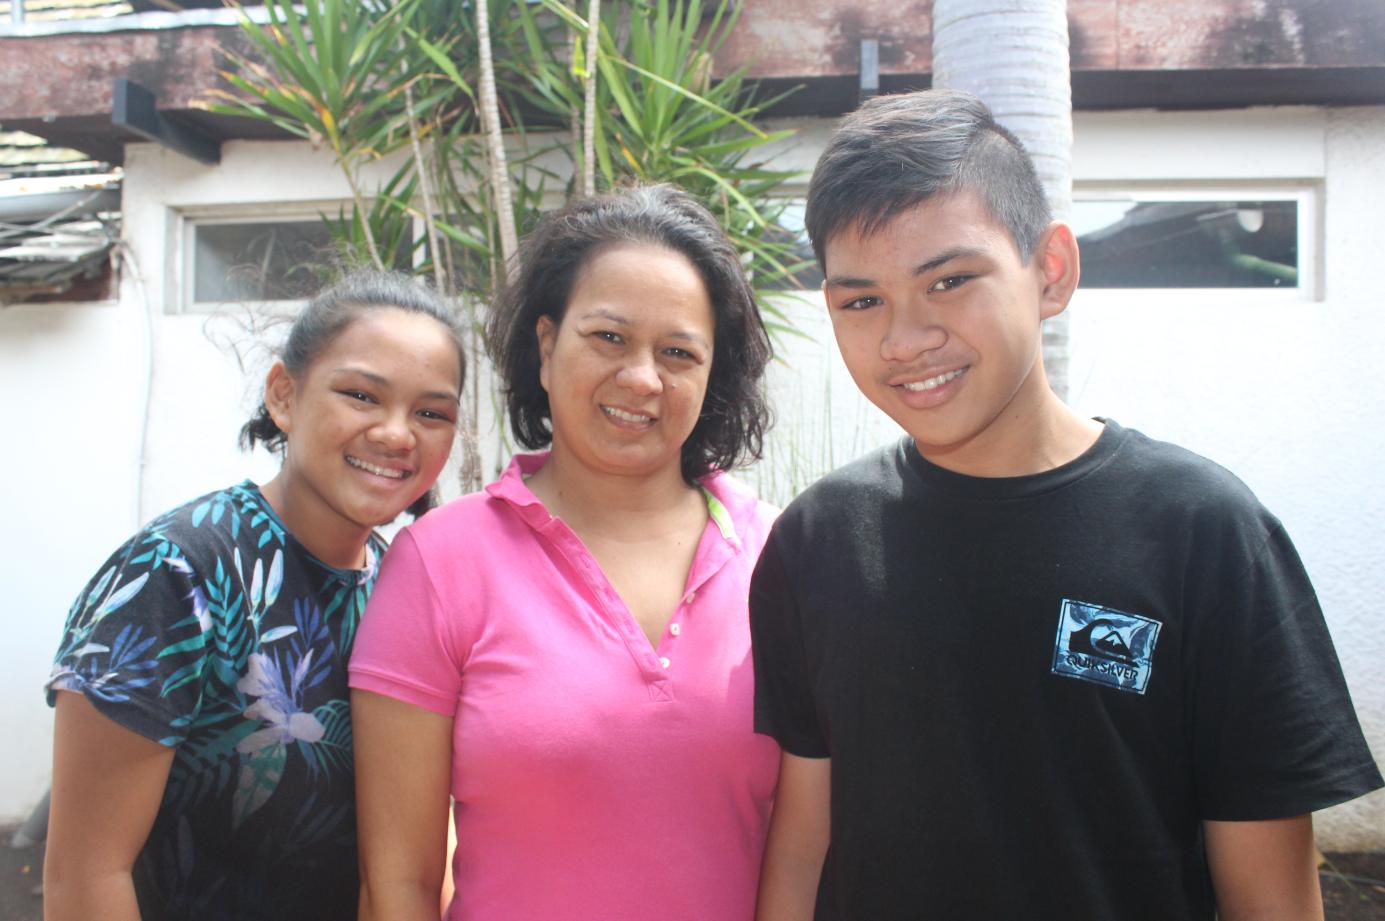 Yolande et ses deux enfants, Hinemanea et Heimarama.